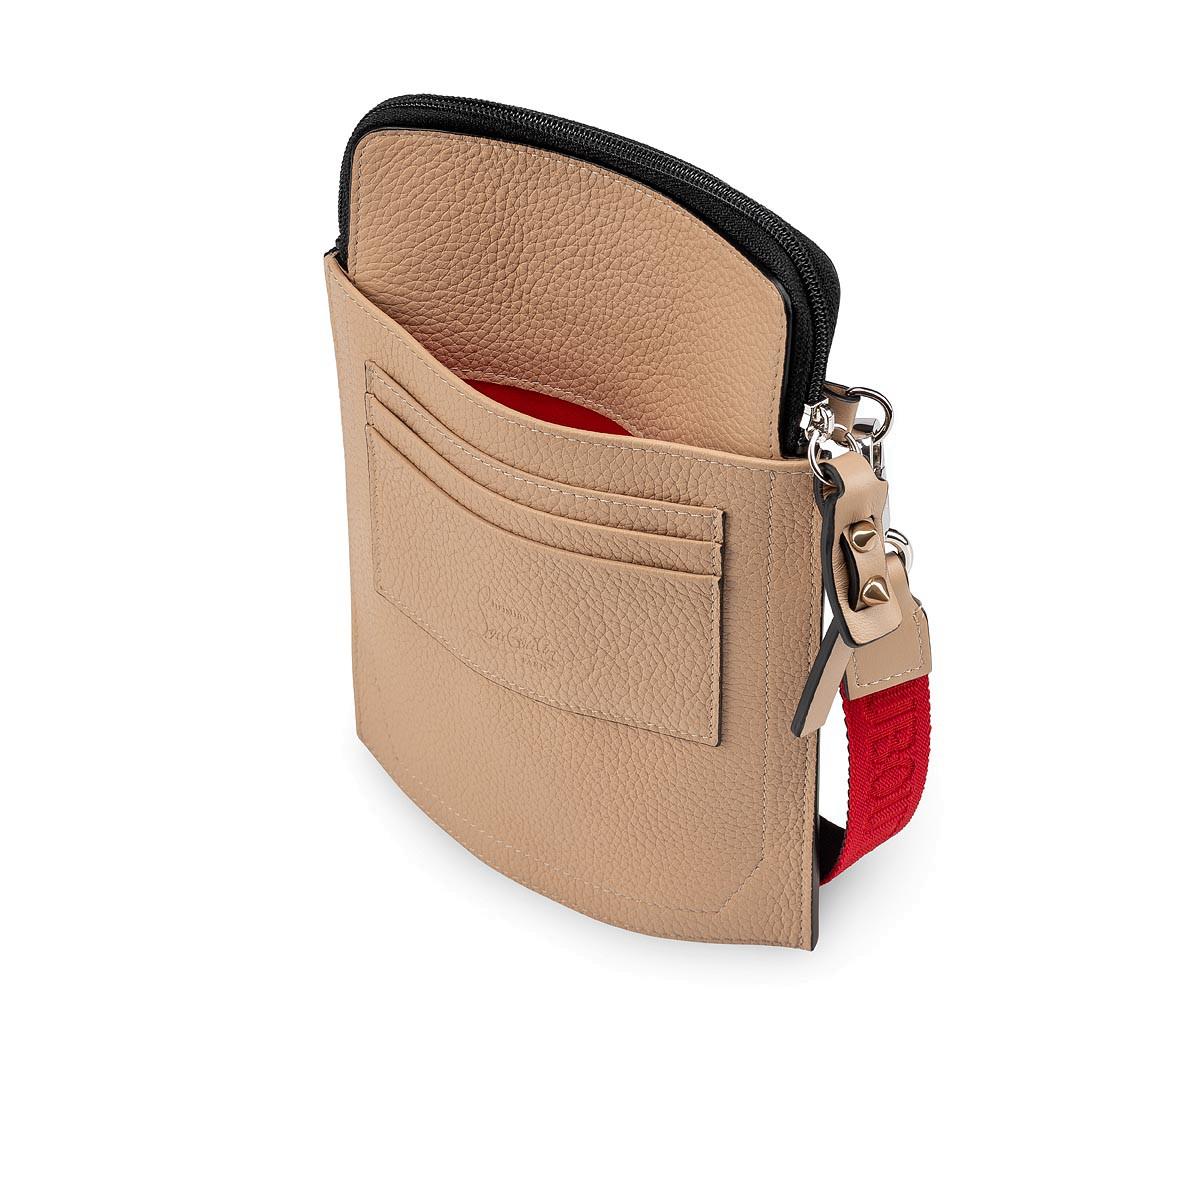 Small Leather Goods - Loubilab - Christian Louboutin